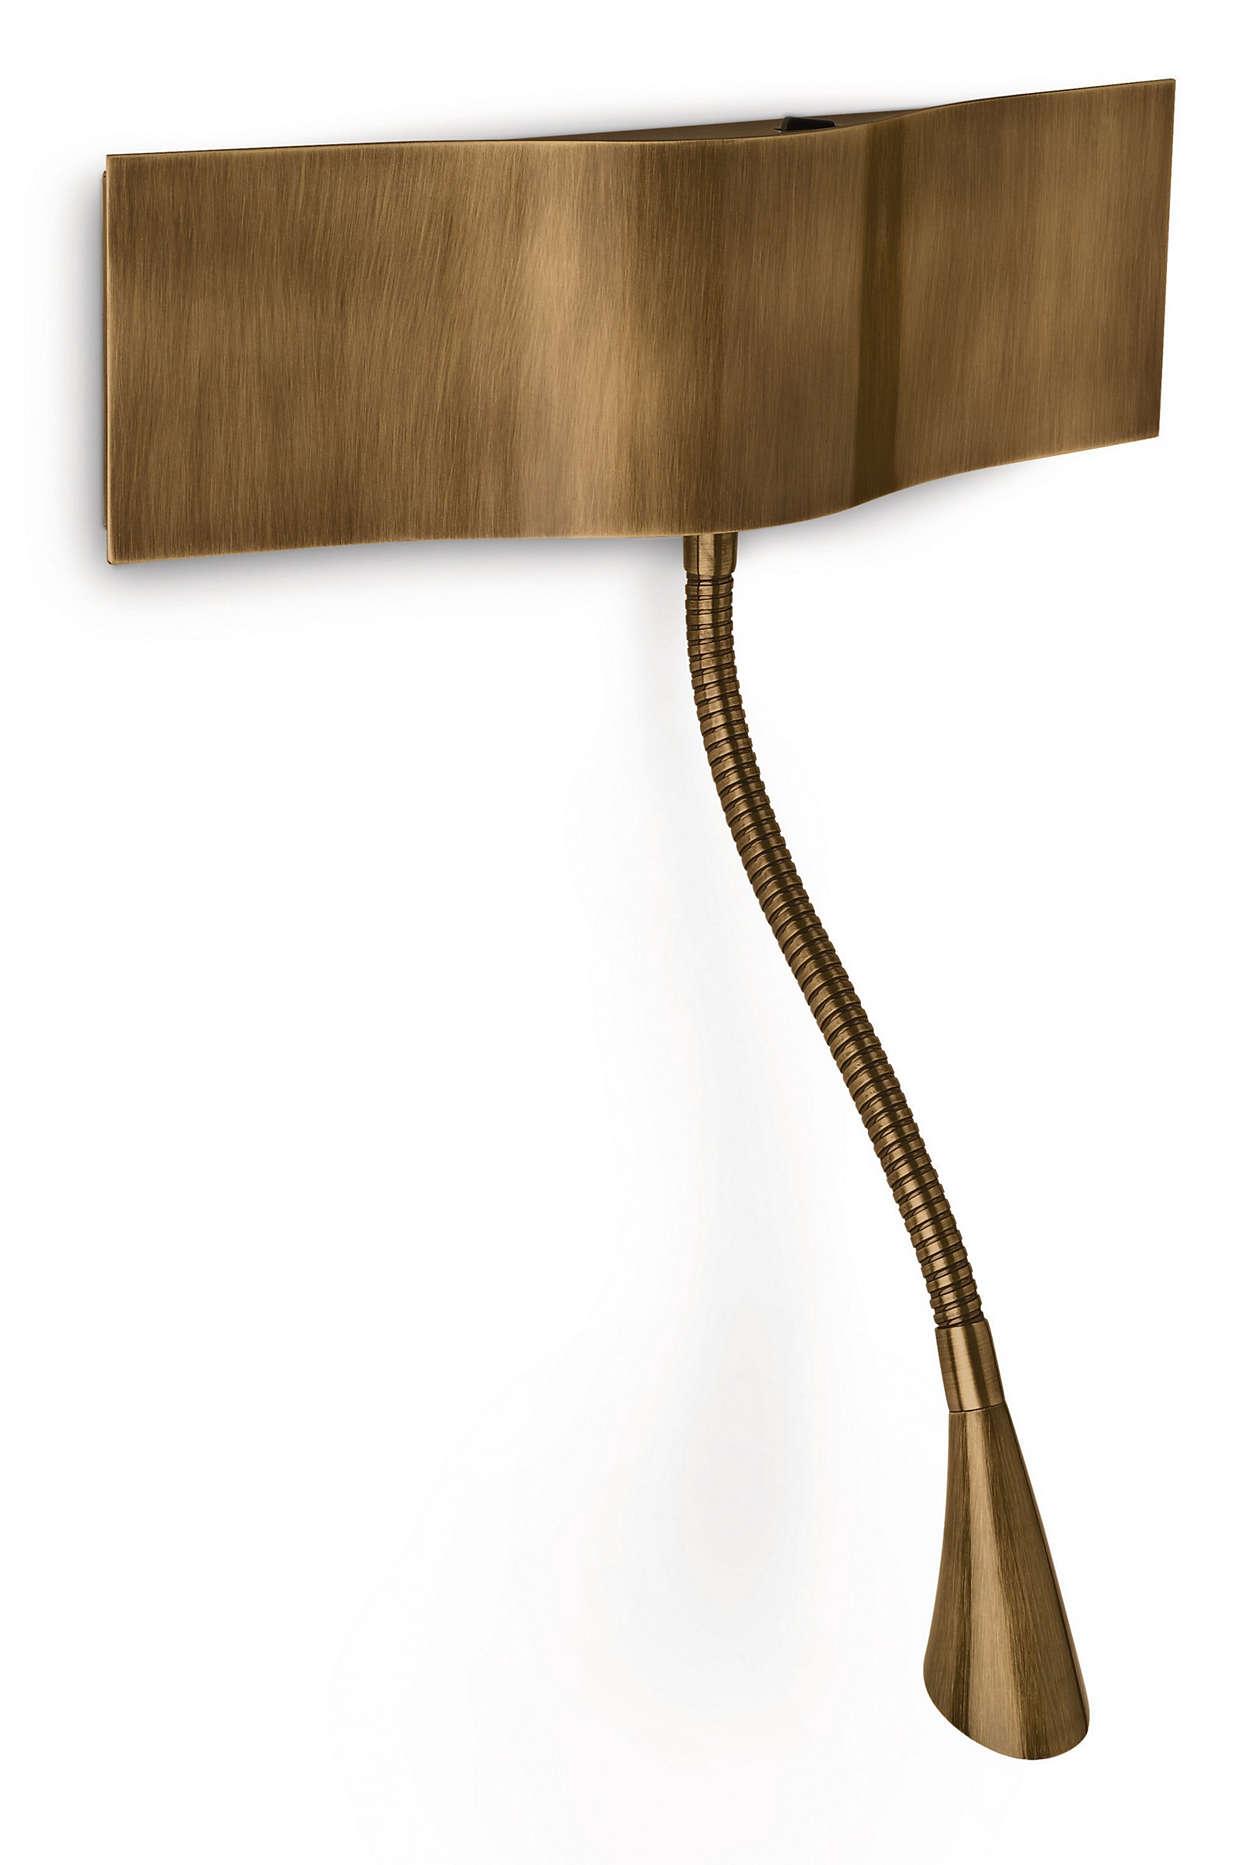 instyle wandleuchte probo von philips. Black Bedroom Furniture Sets. Home Design Ideas